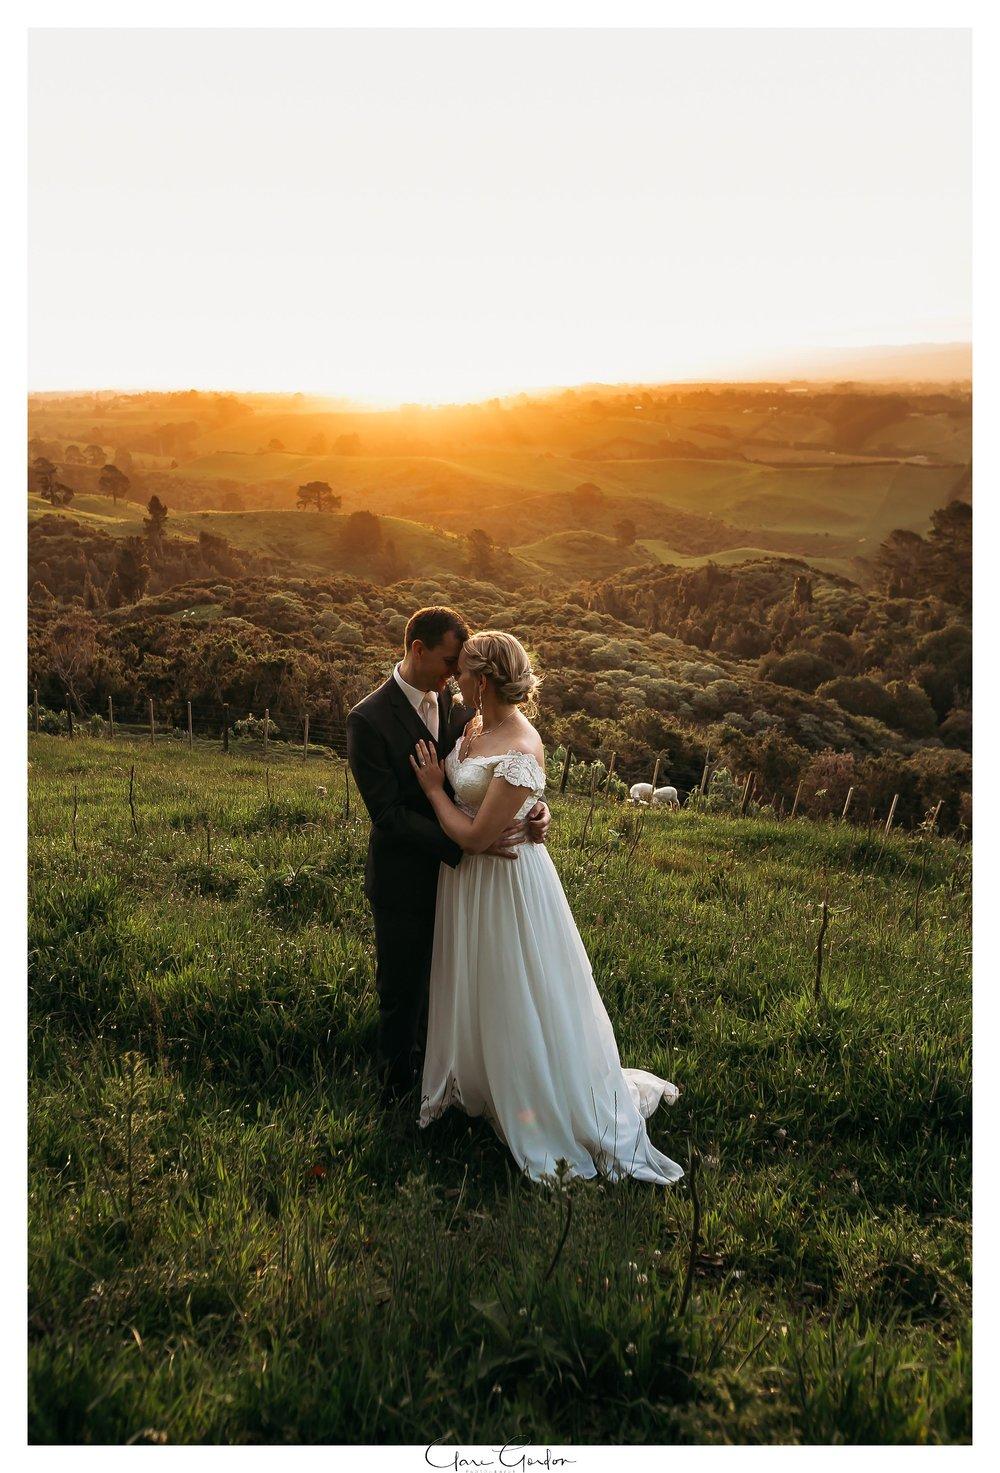 Eagle-Ridge-wedding-photo-sunset-couple-hugging-Tauranga (152).jpg